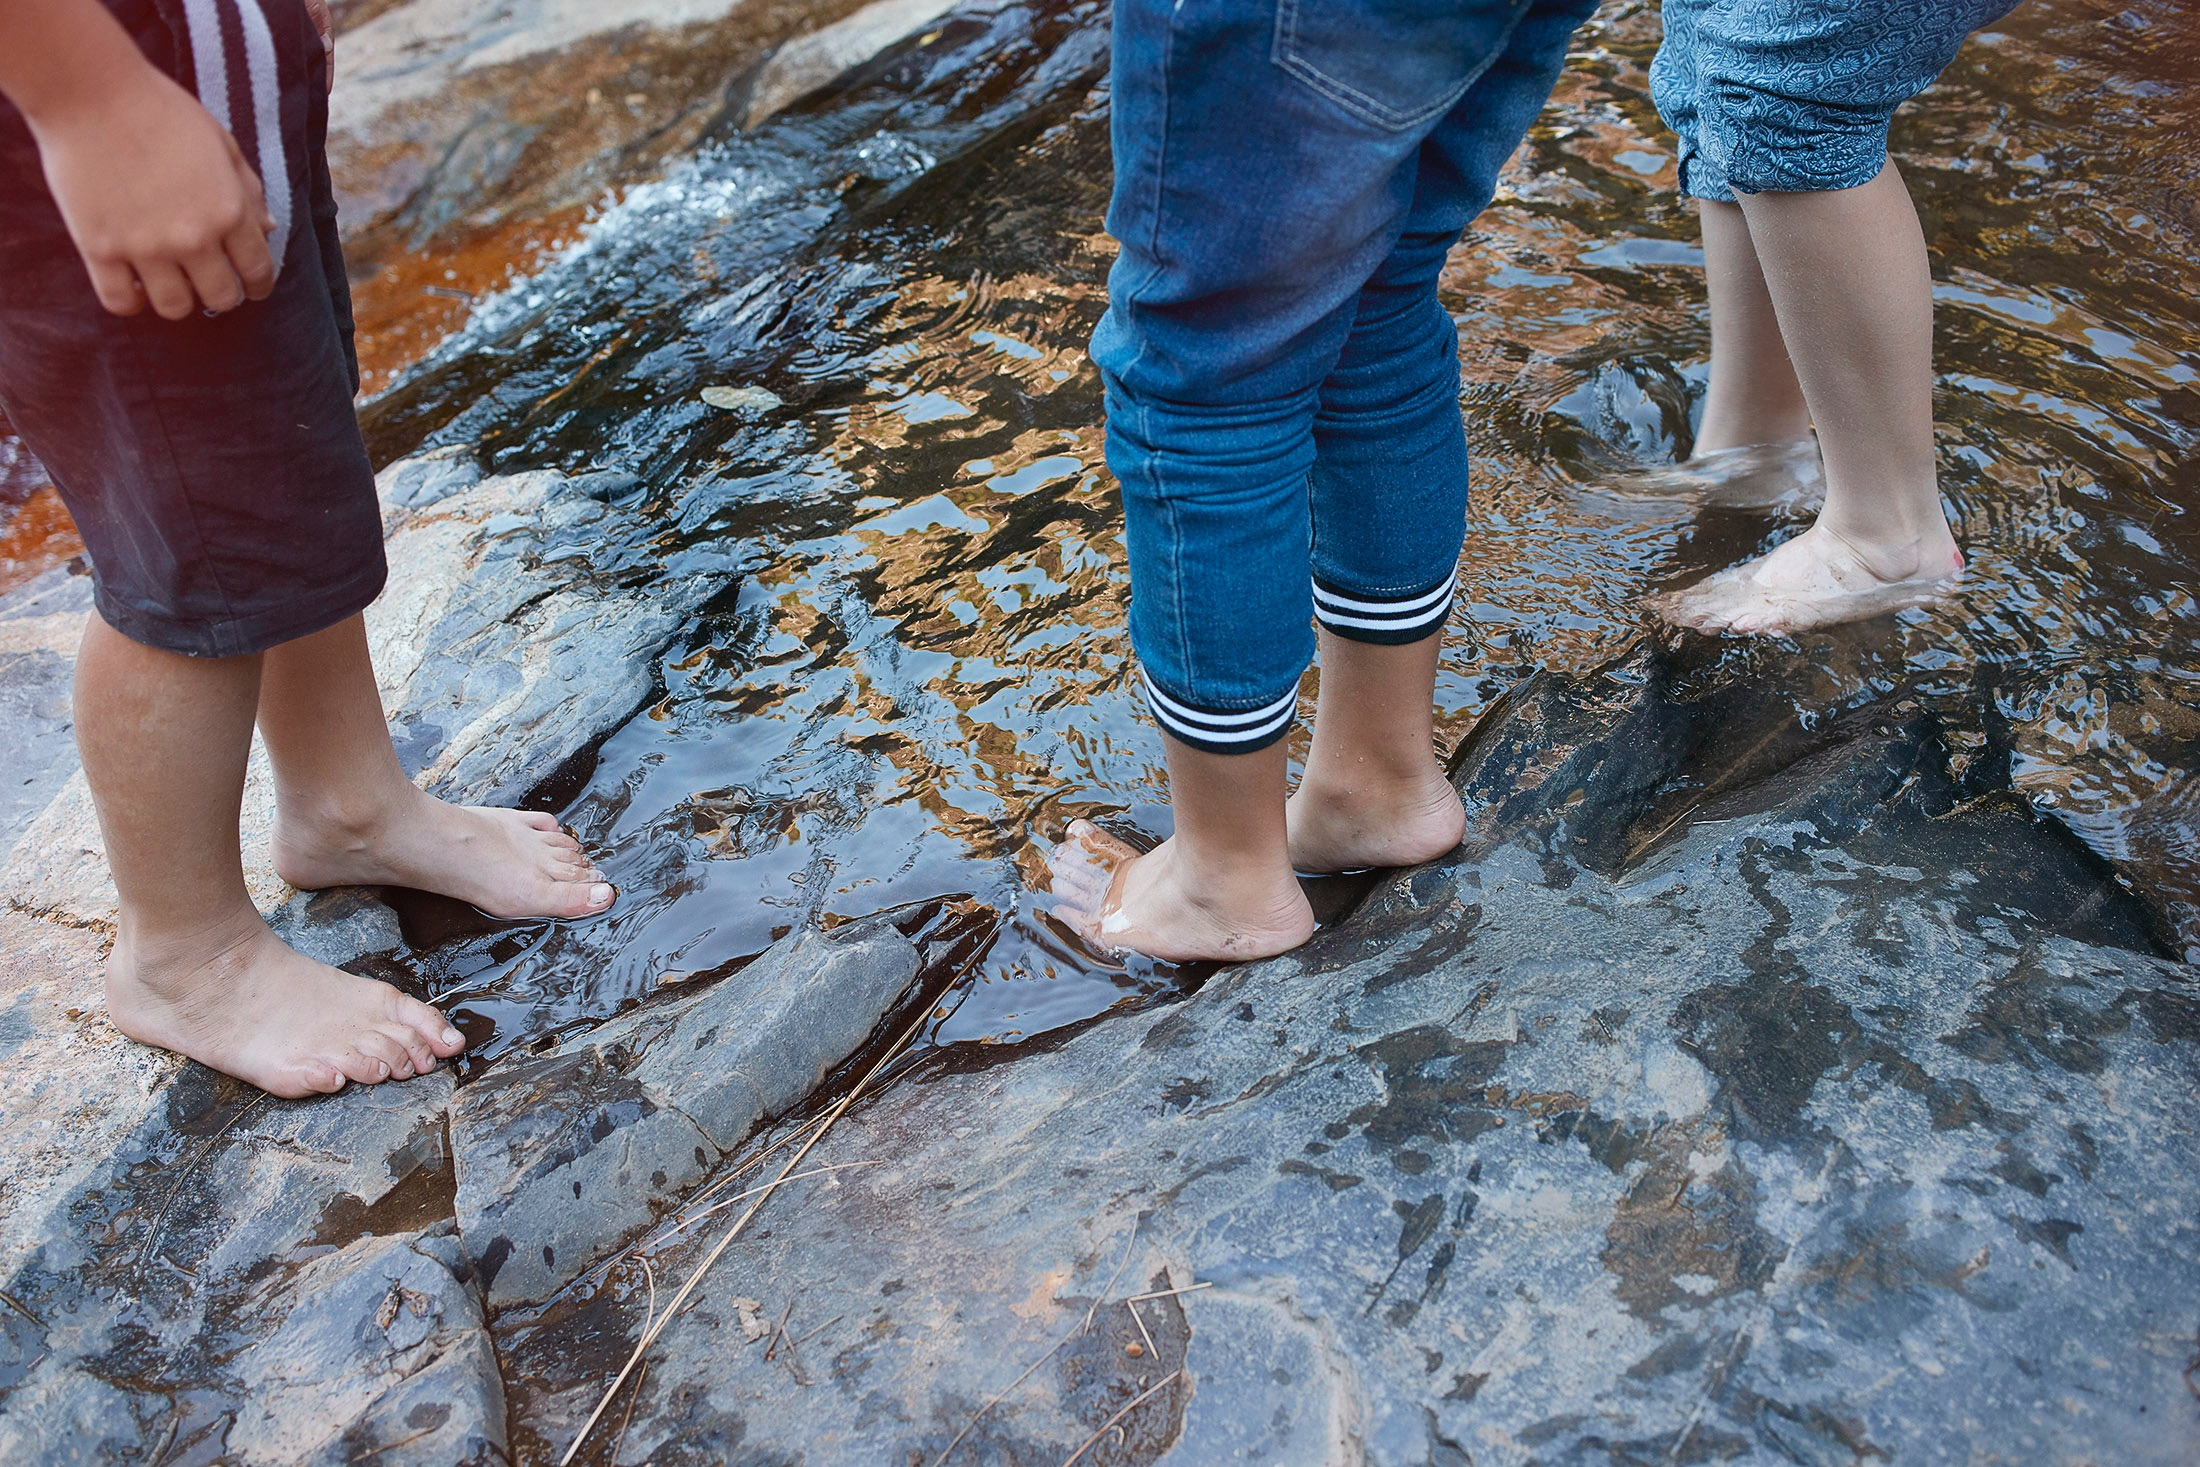 photo photography photographer kid child children rocks stones river water adventure friends wet feet